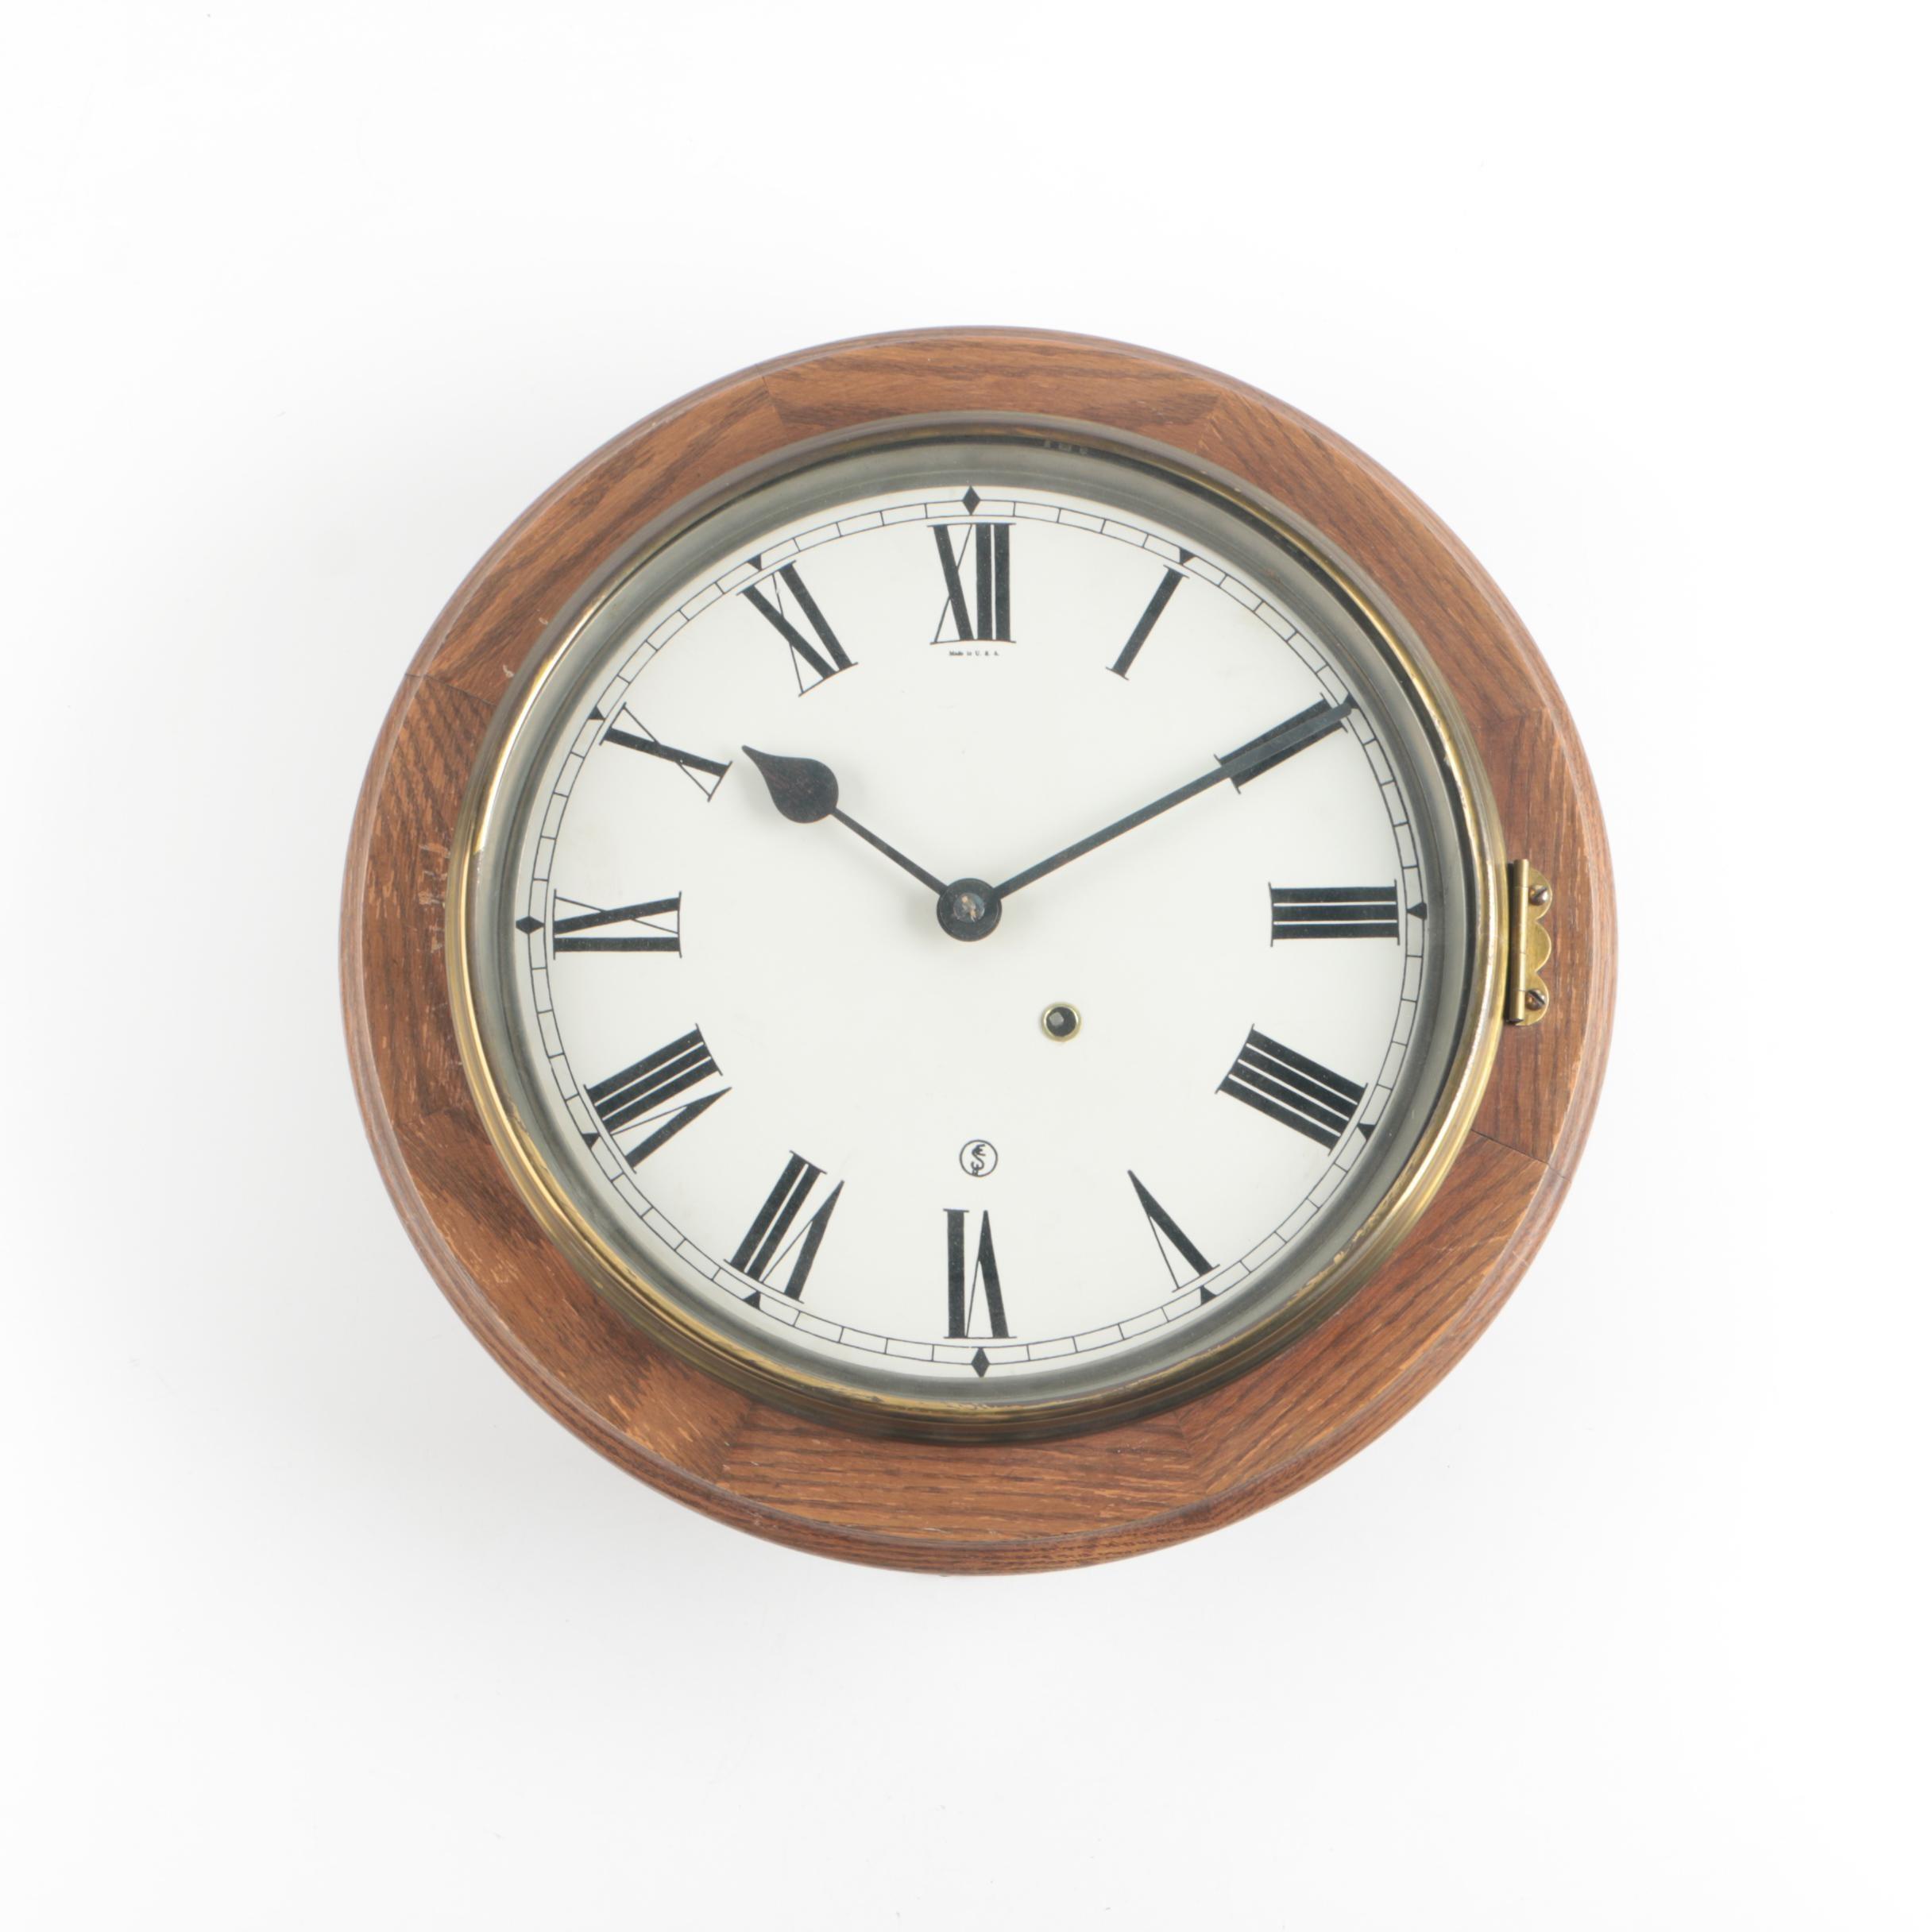 Circa 1920 Seth Thomas Oak Gallery Style Wall Clock